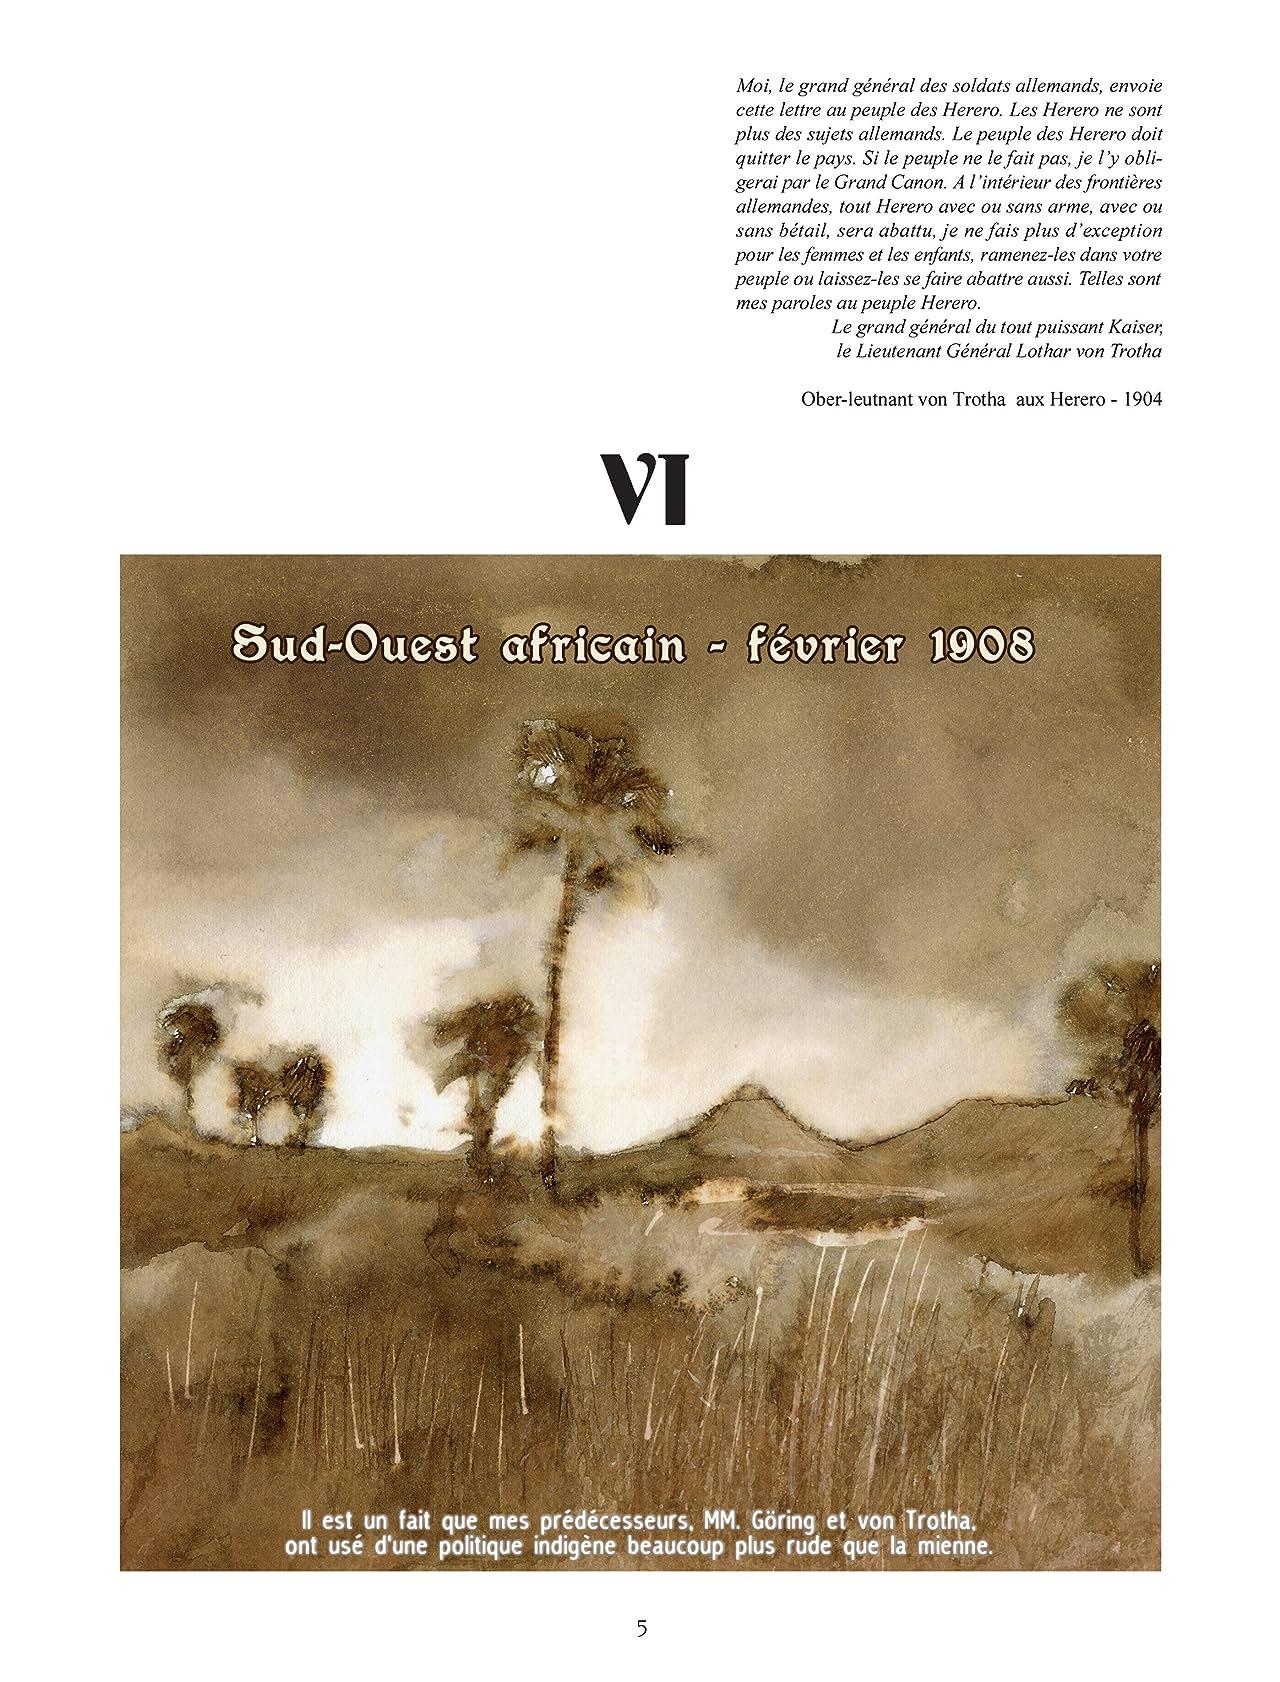 Fritz Haber Vol. 2: Les Héros